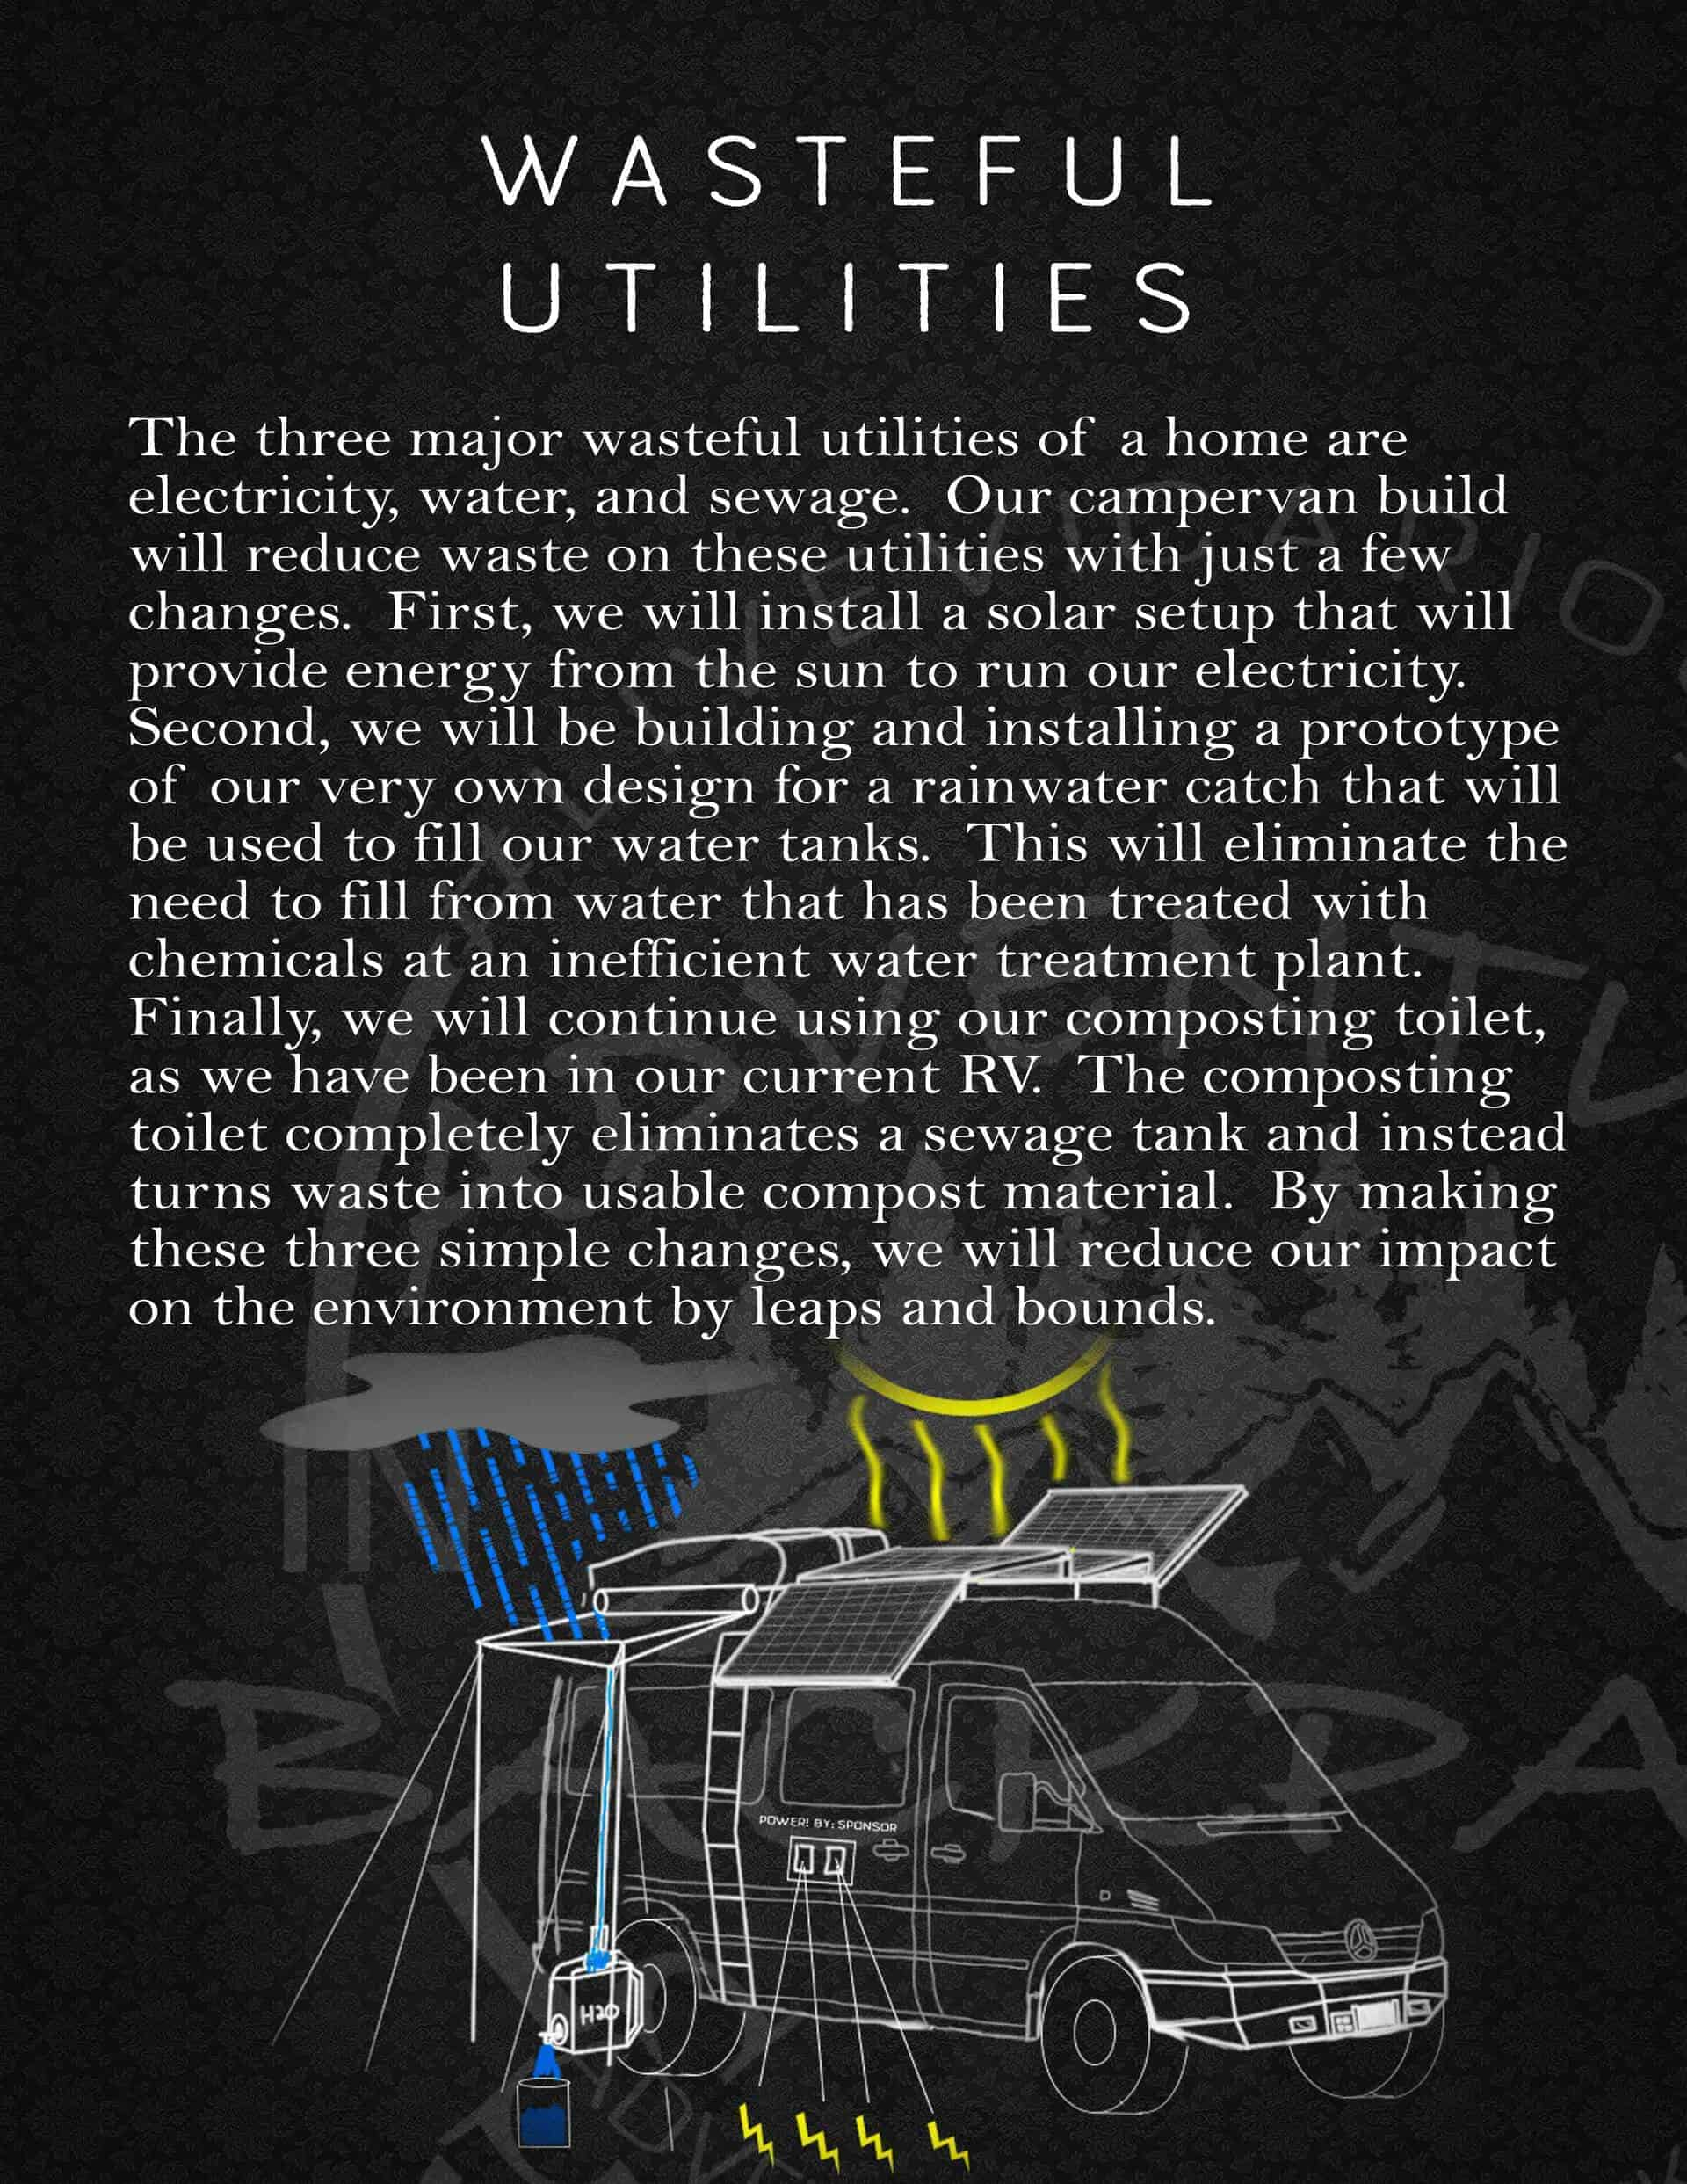 6 Wasteful Utilities